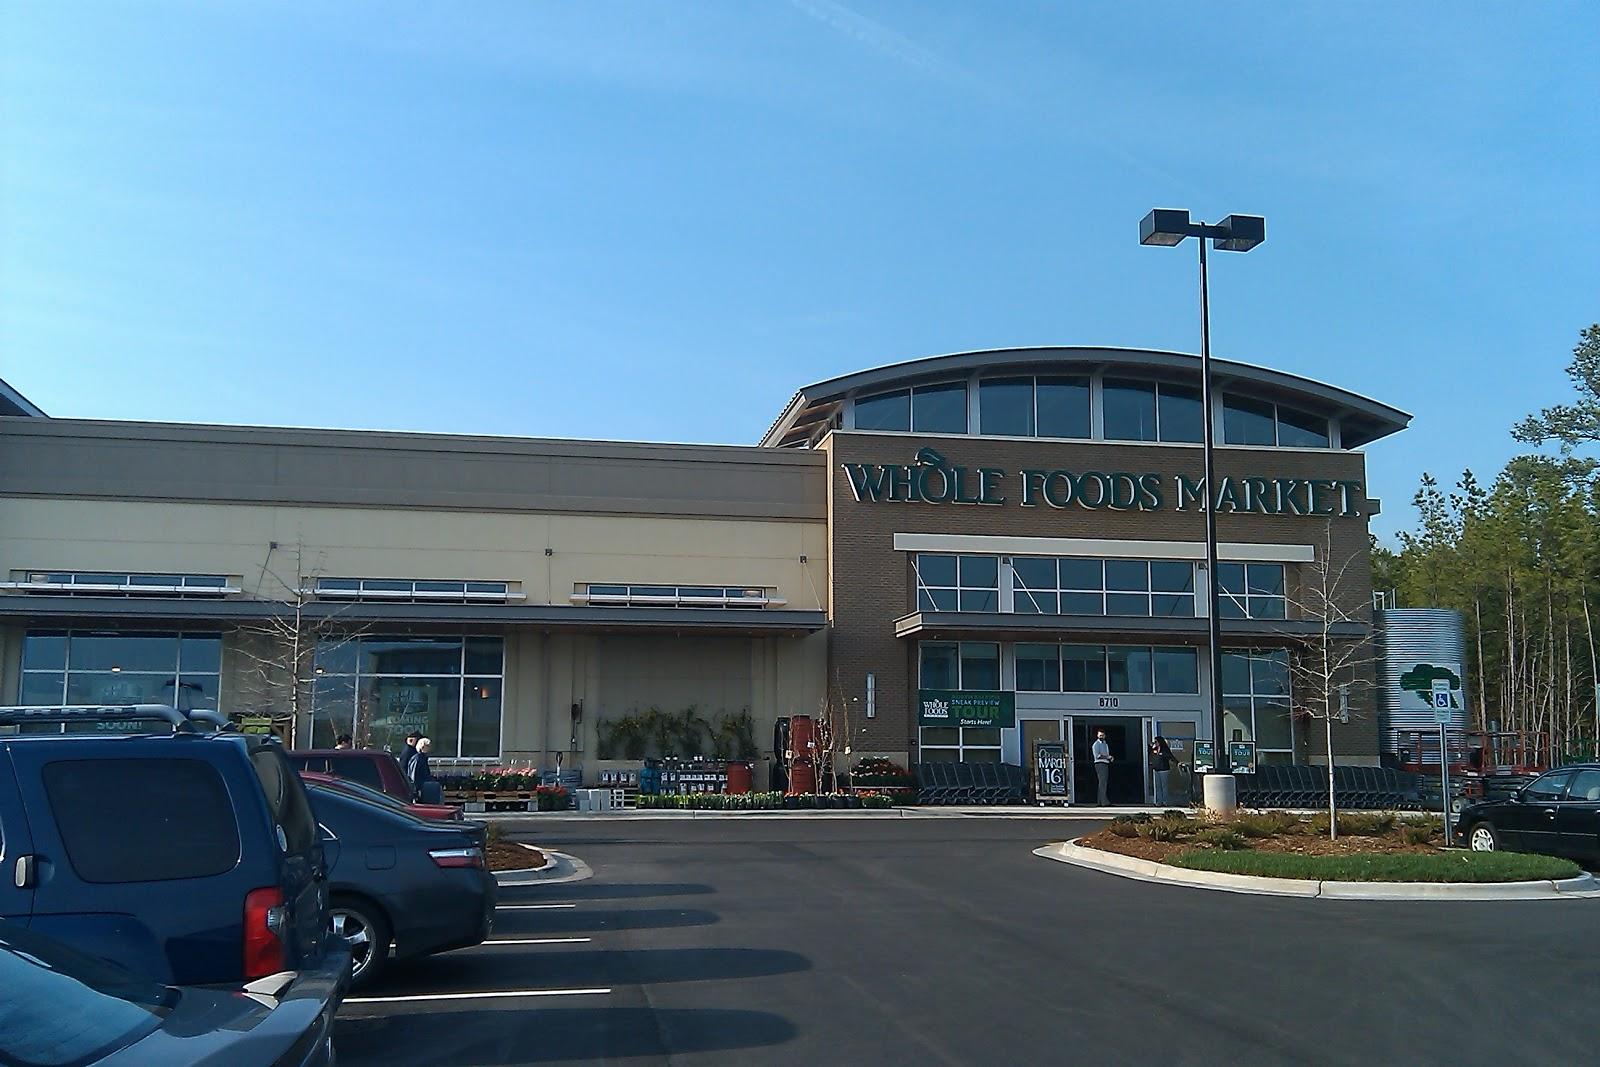 Whole Foods Woodruff Road